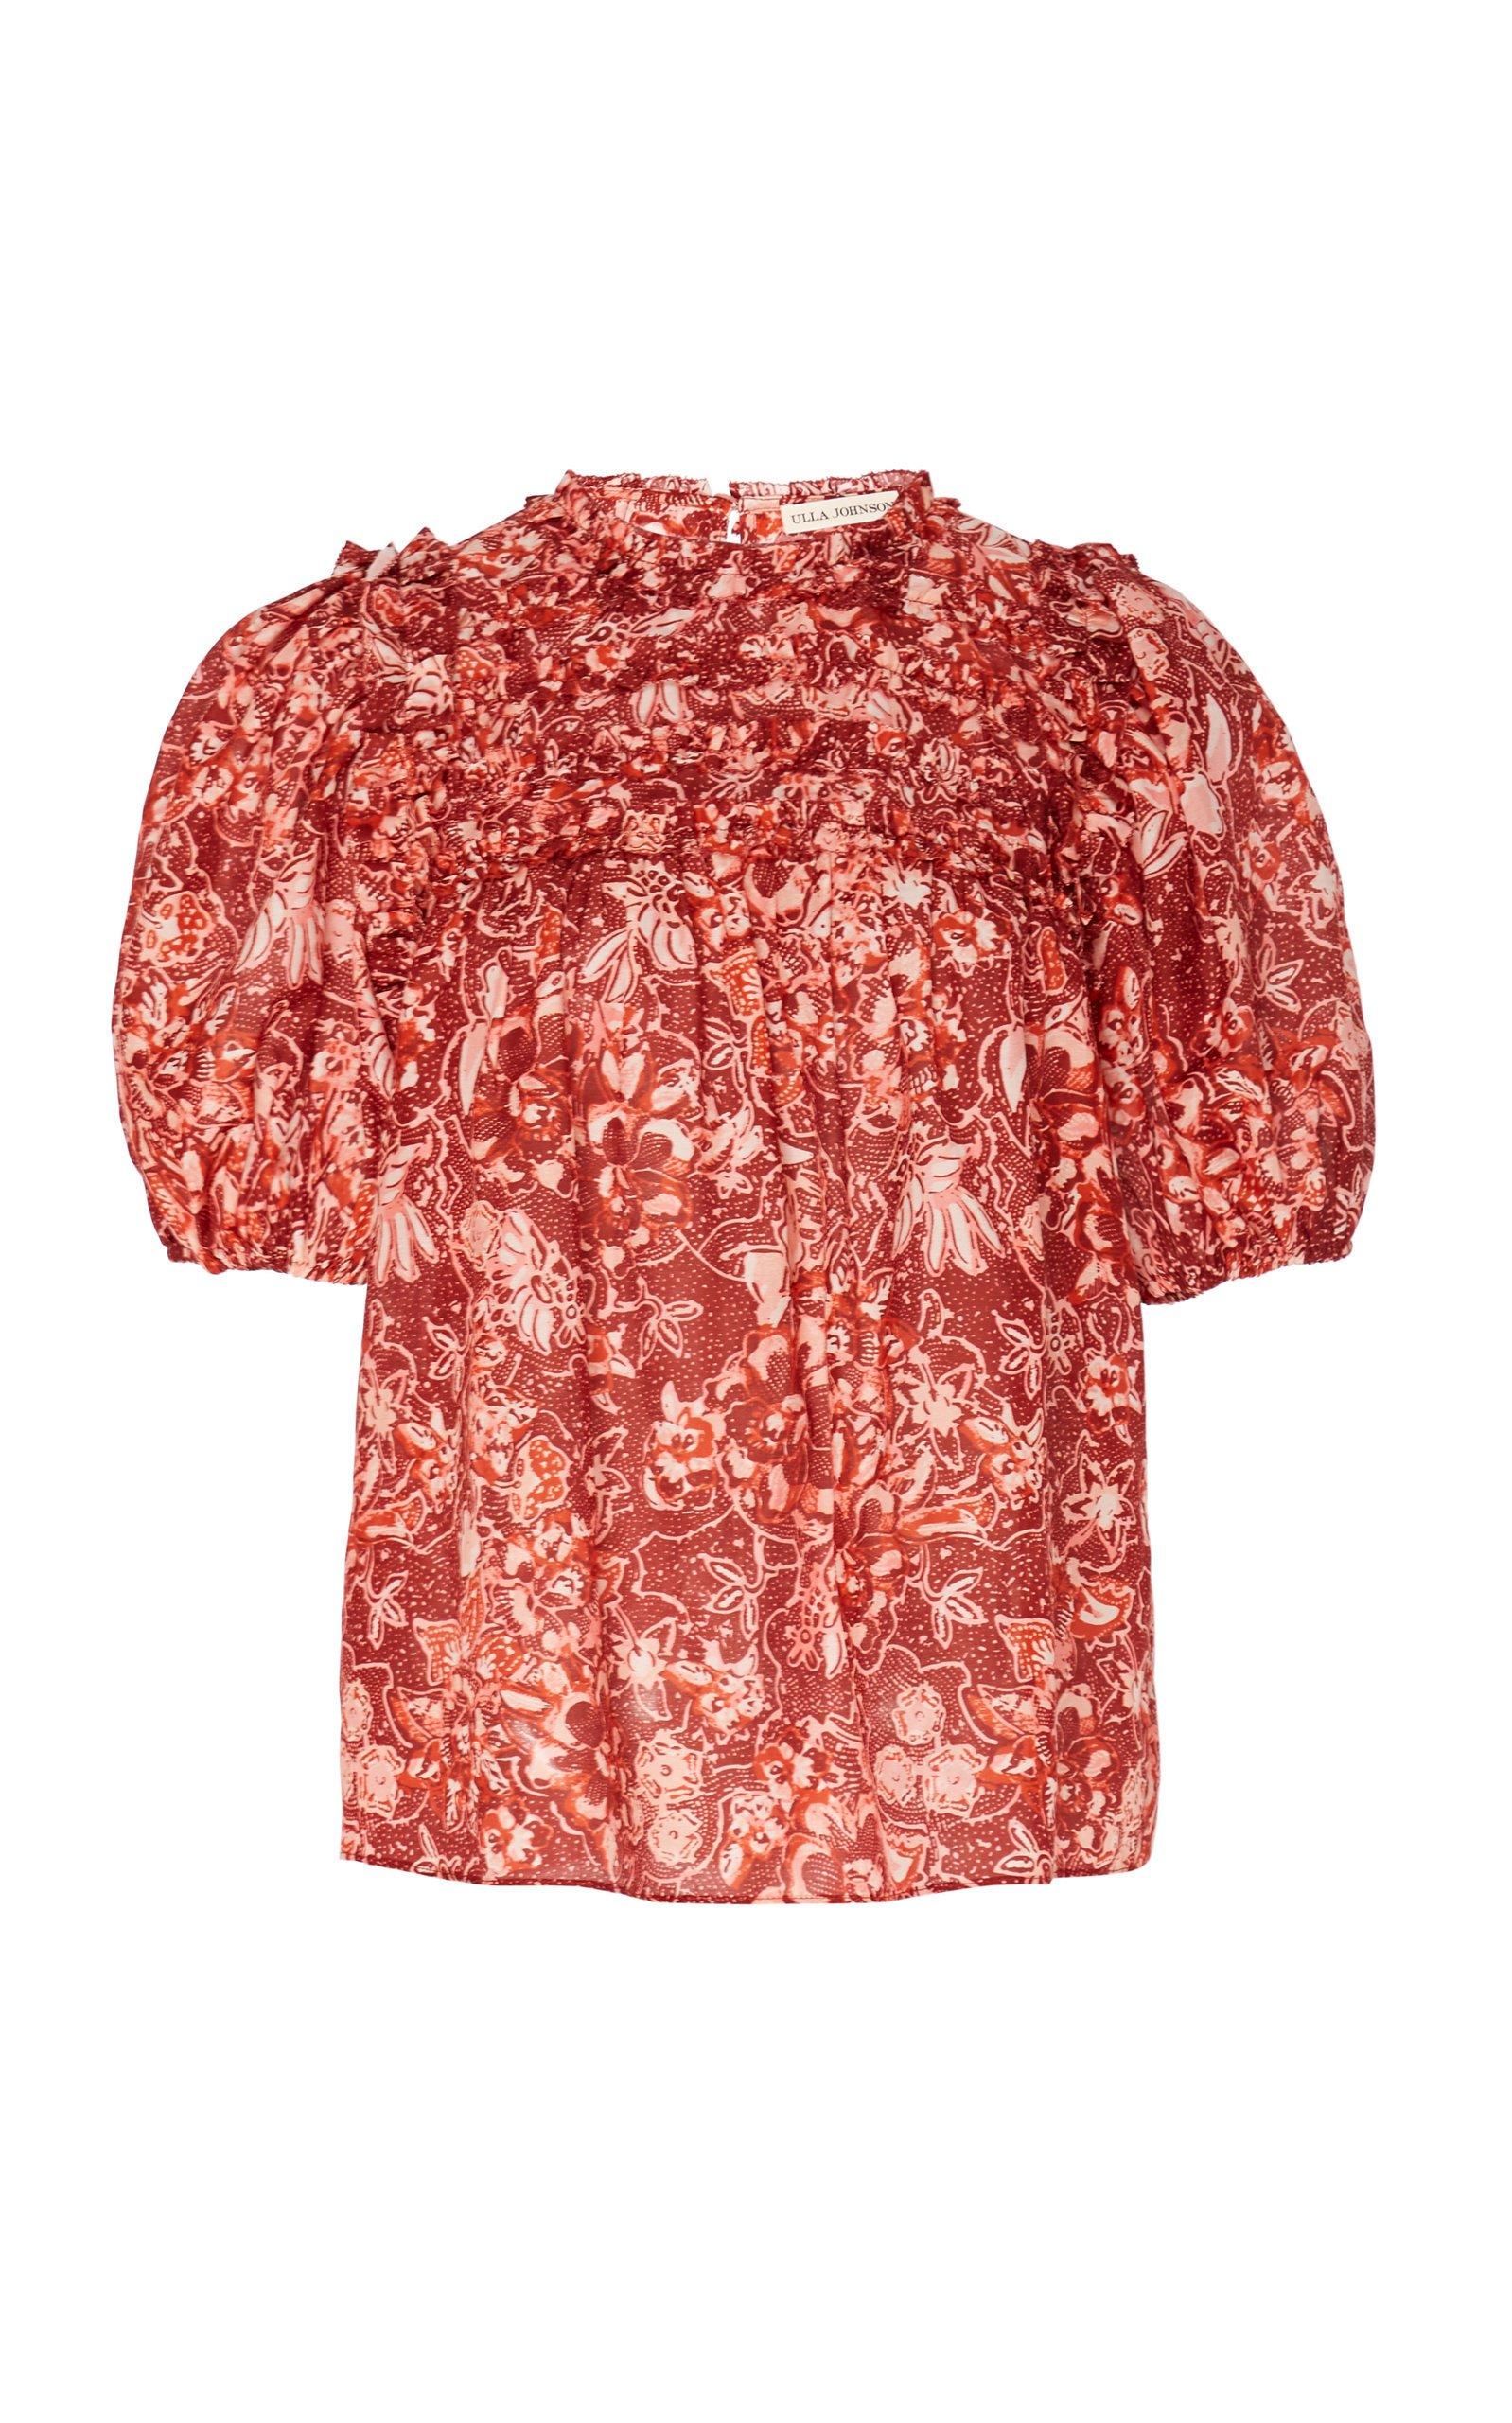 Ulla Johnson Klea Puff Sleeve Floral Top